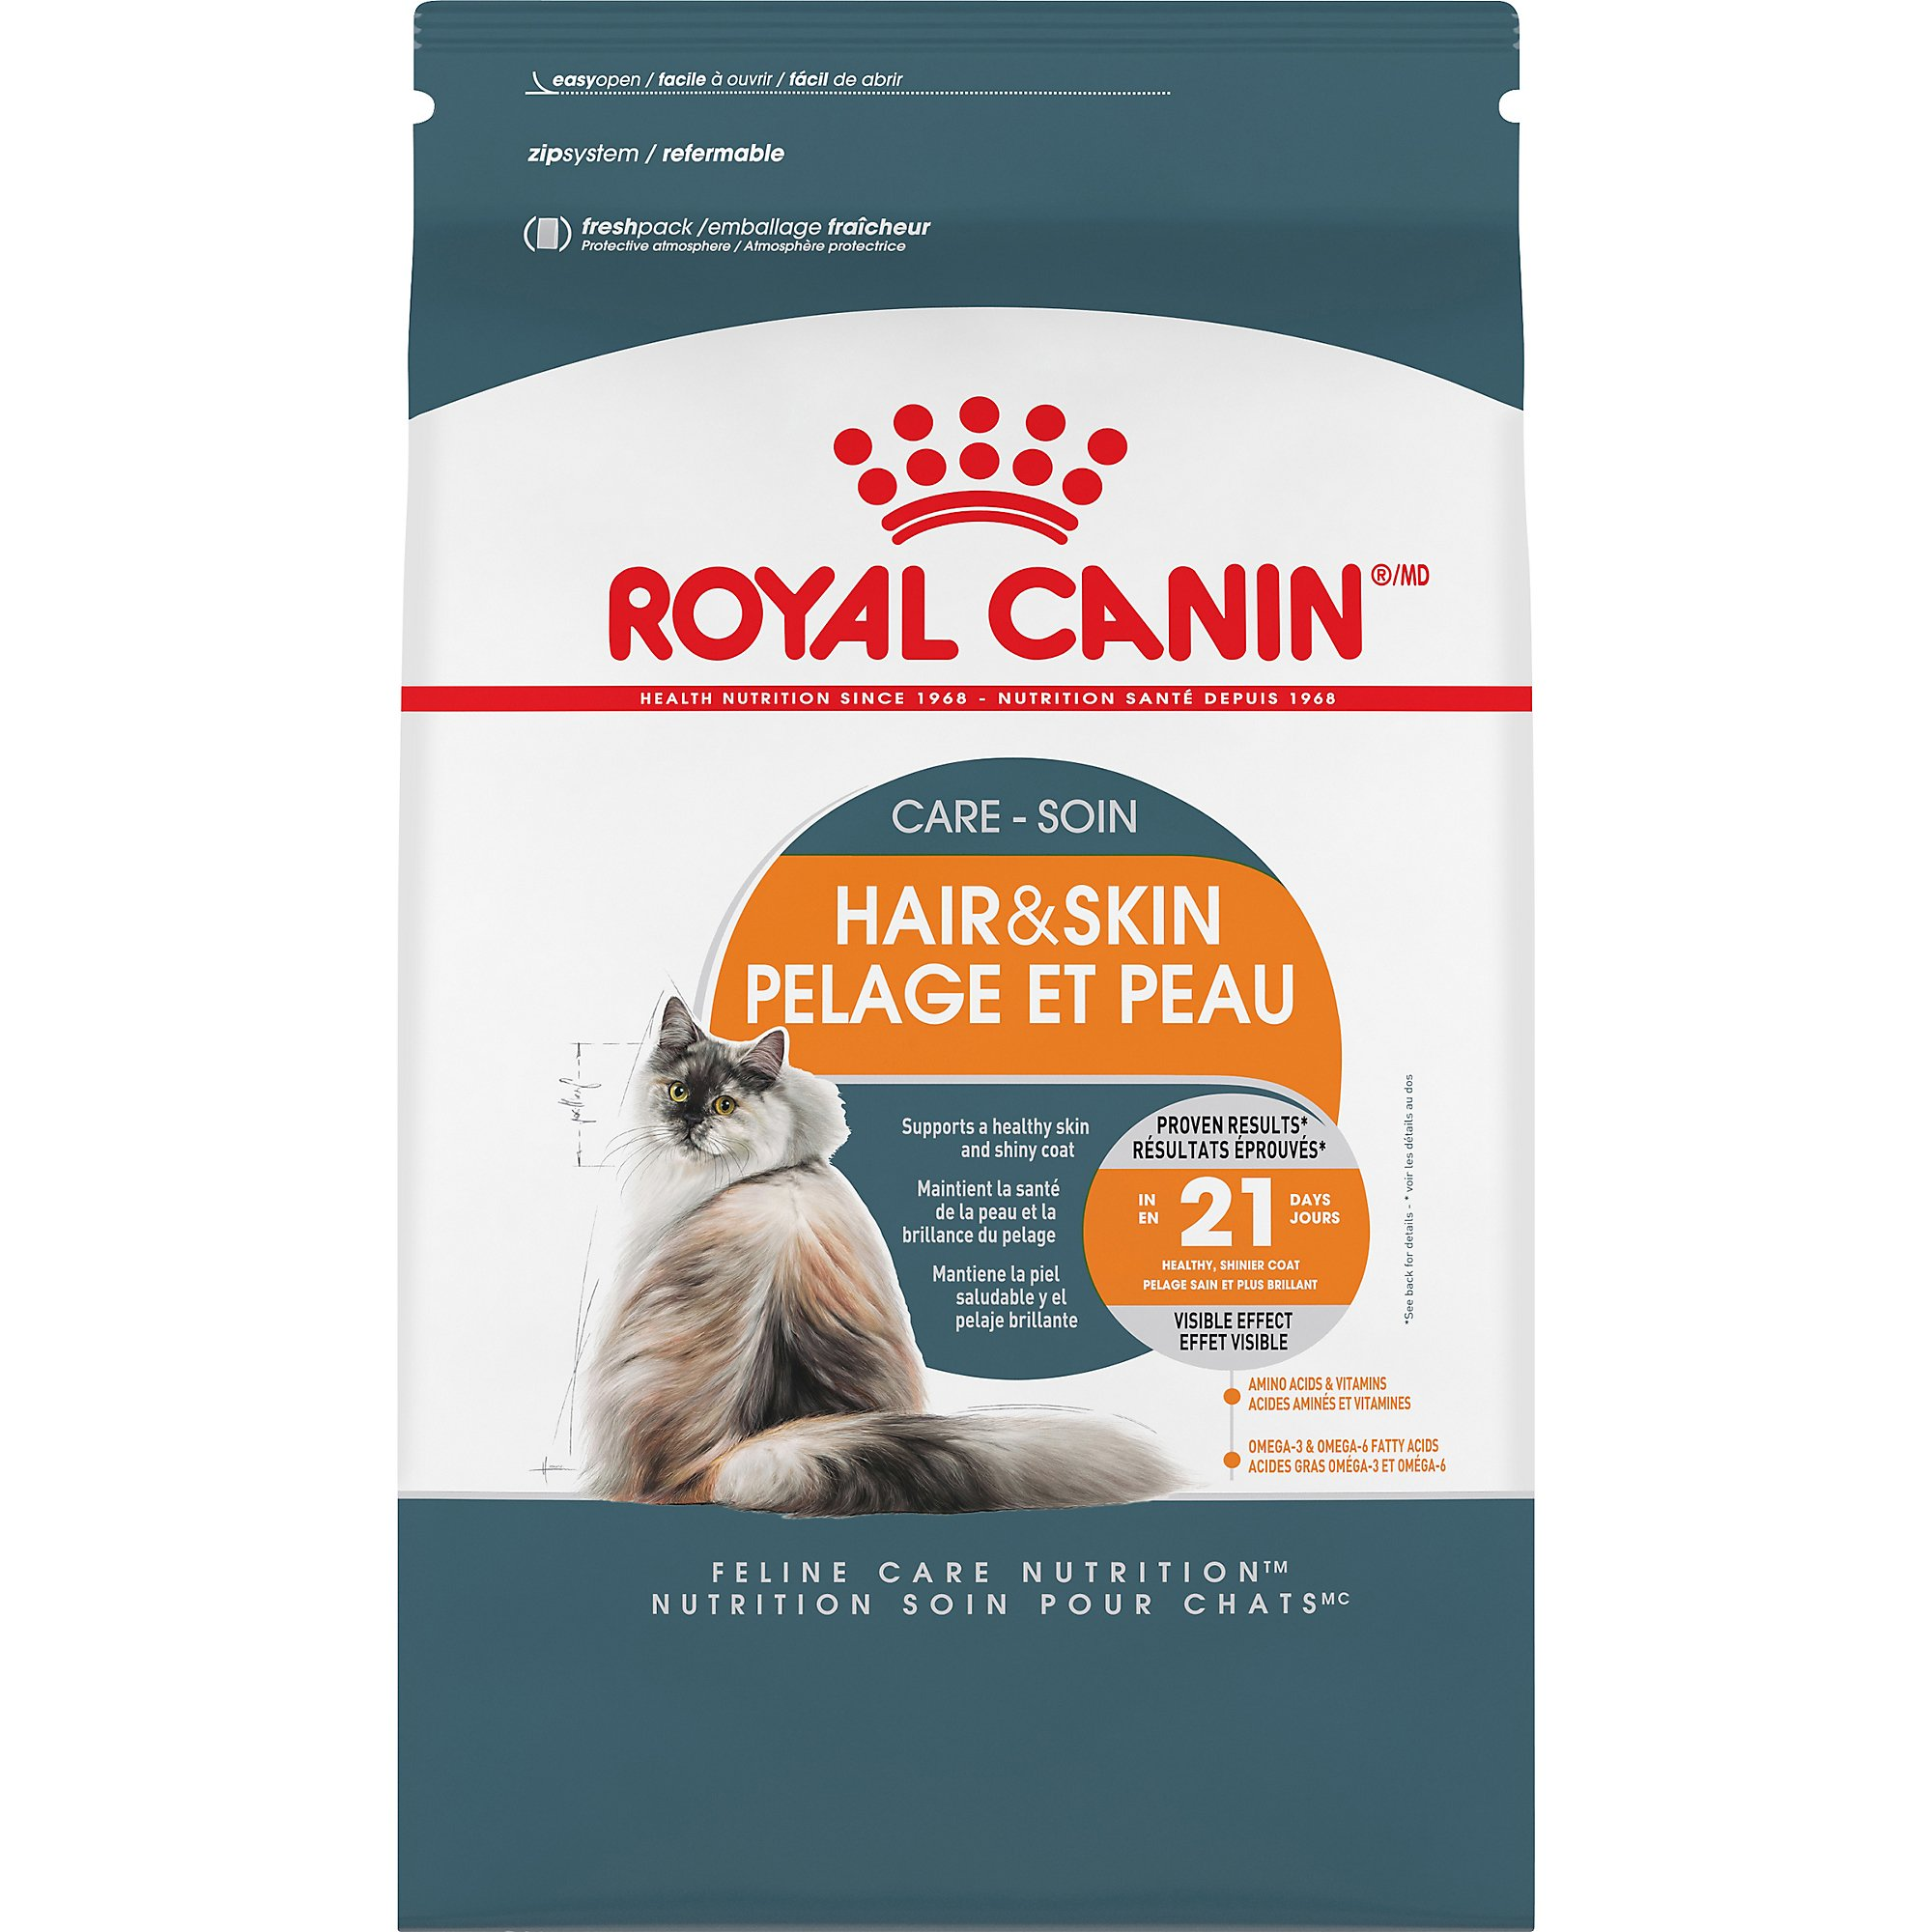 Royal Canin Feline Care Nutrition Hair & Skin Care Adult Dry Cat Food, 3.5 lb